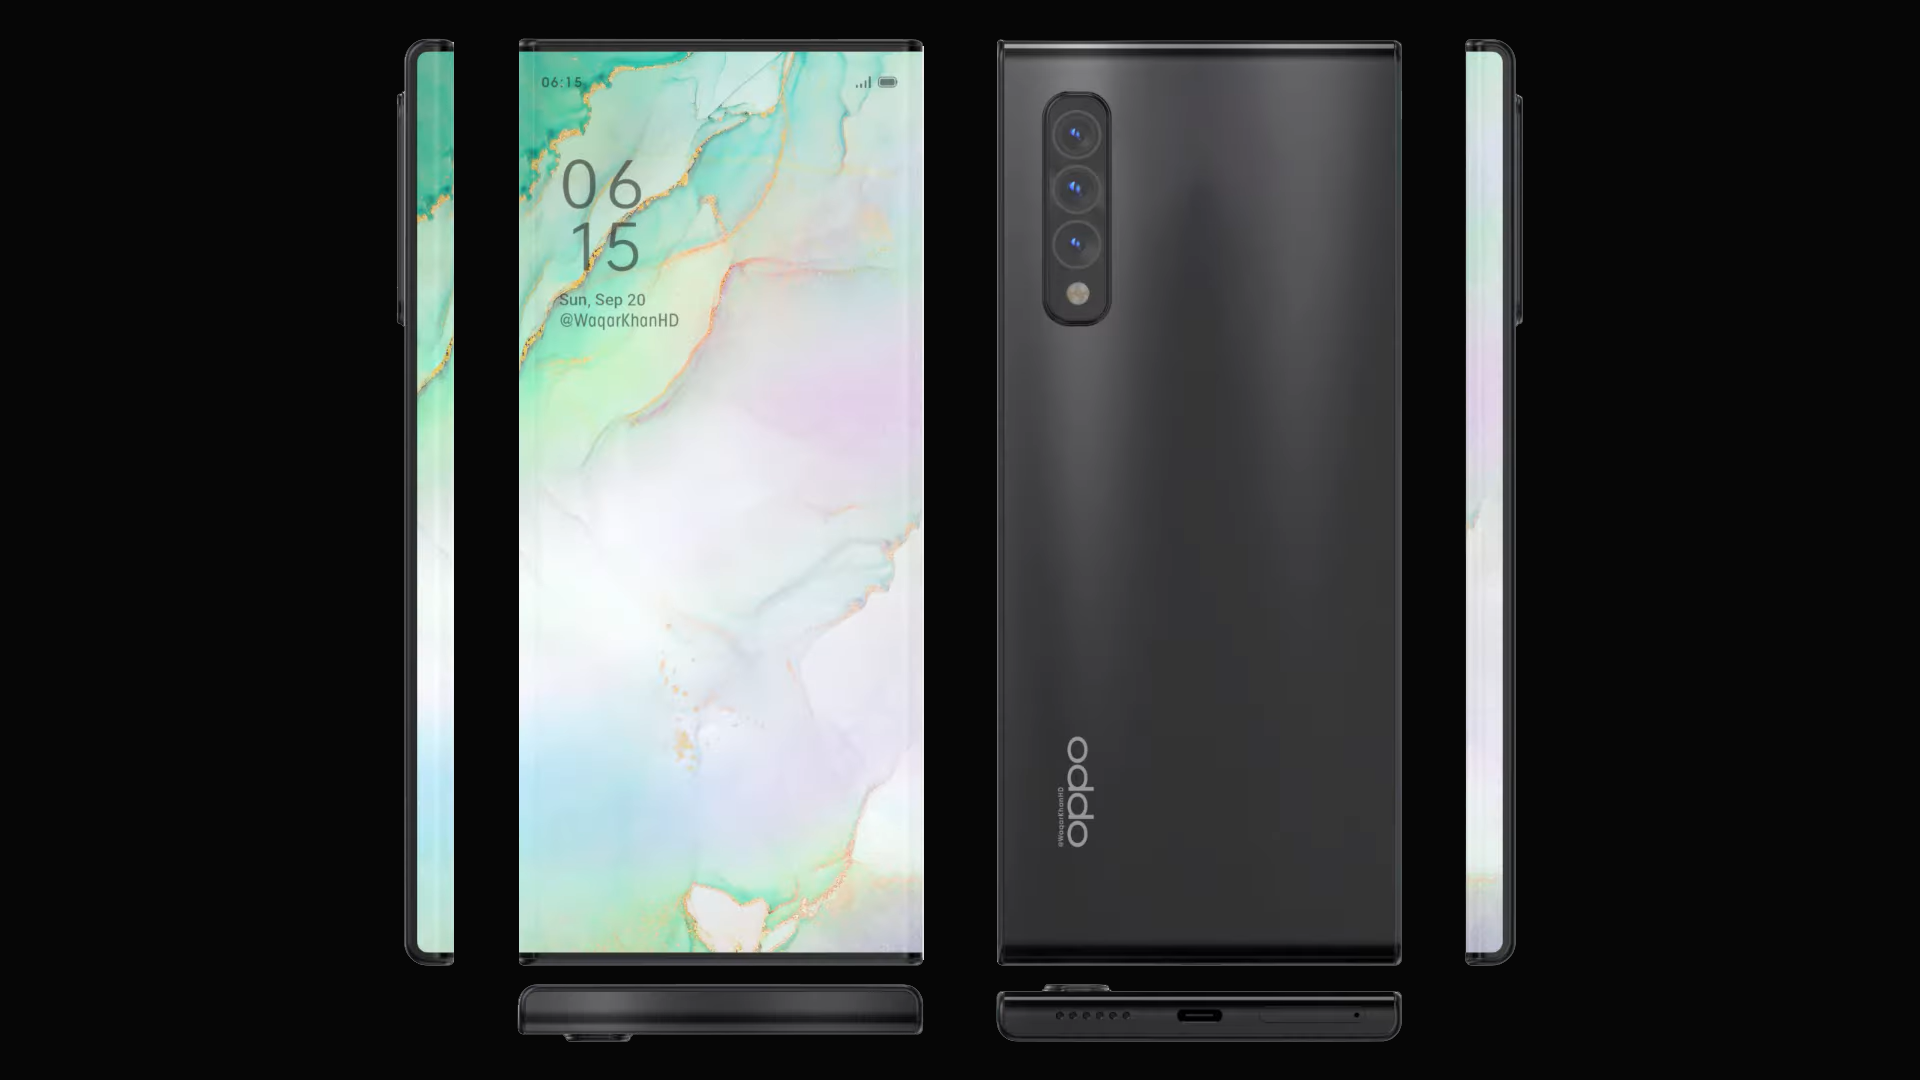 iPhone12迎来对手:2K瀑布屏5nm芯片125W闪充 OPPO开始秀实力